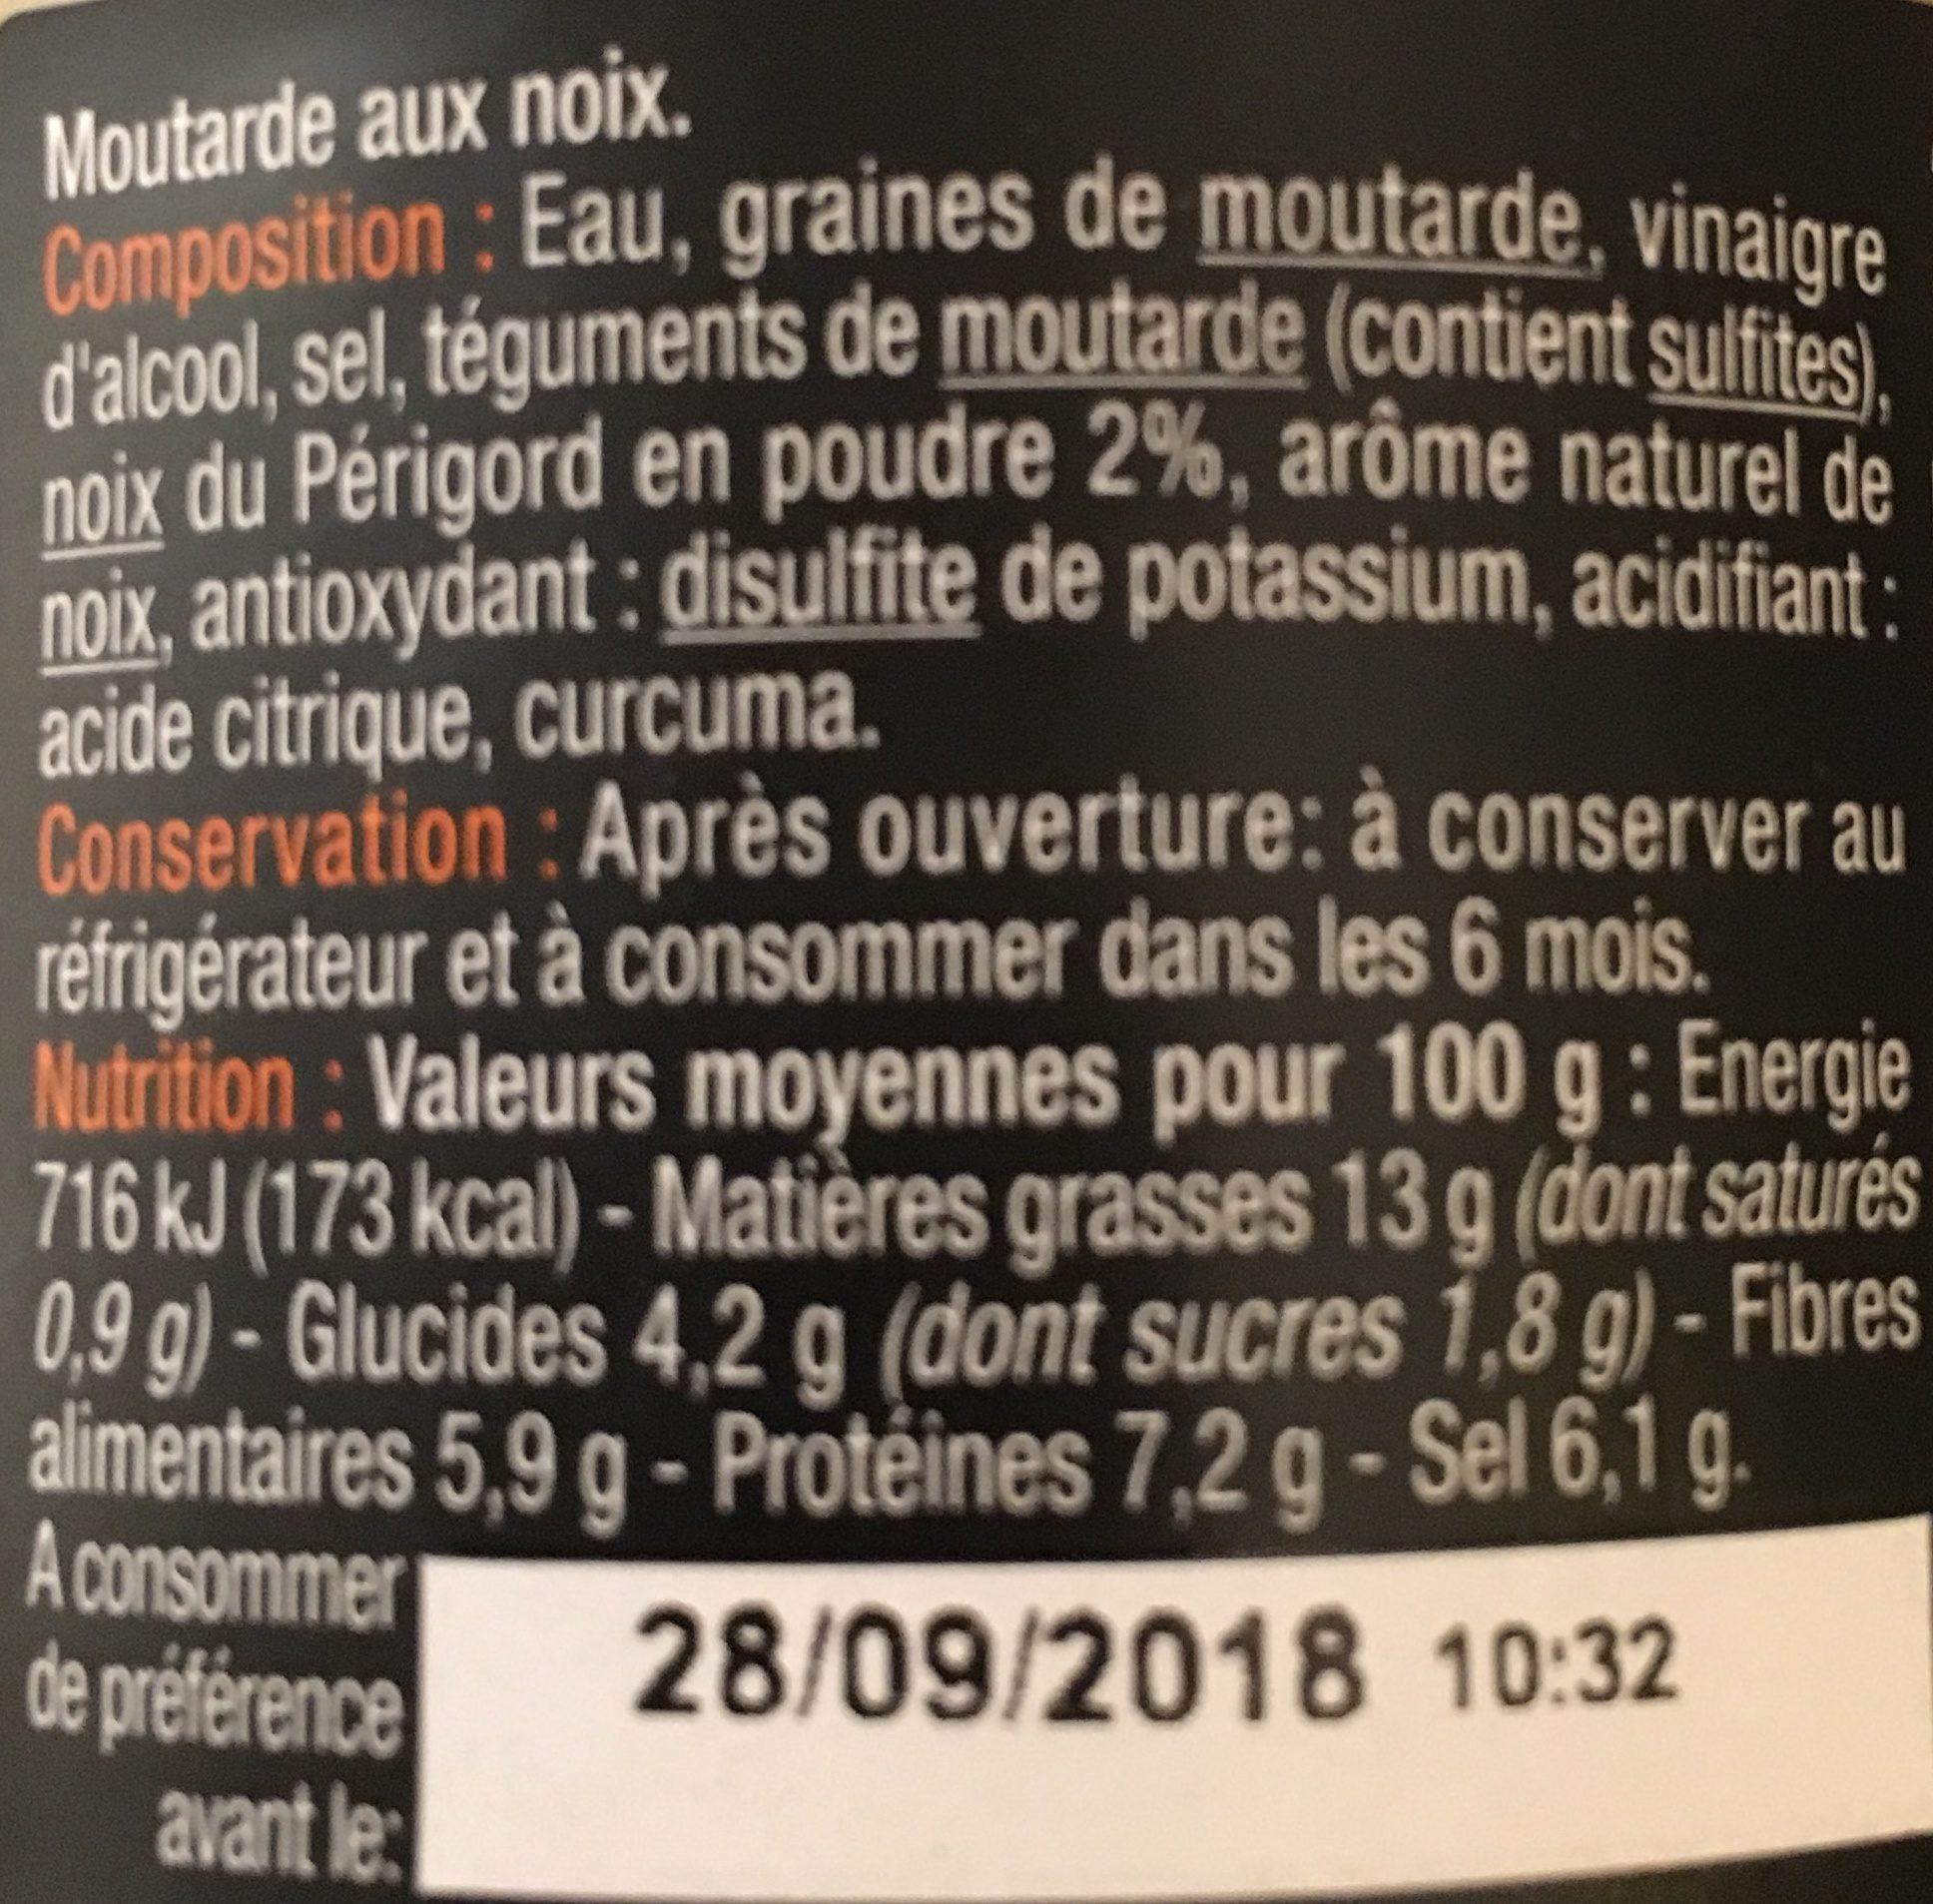 Moutarde aux noix - Ingredients - fr